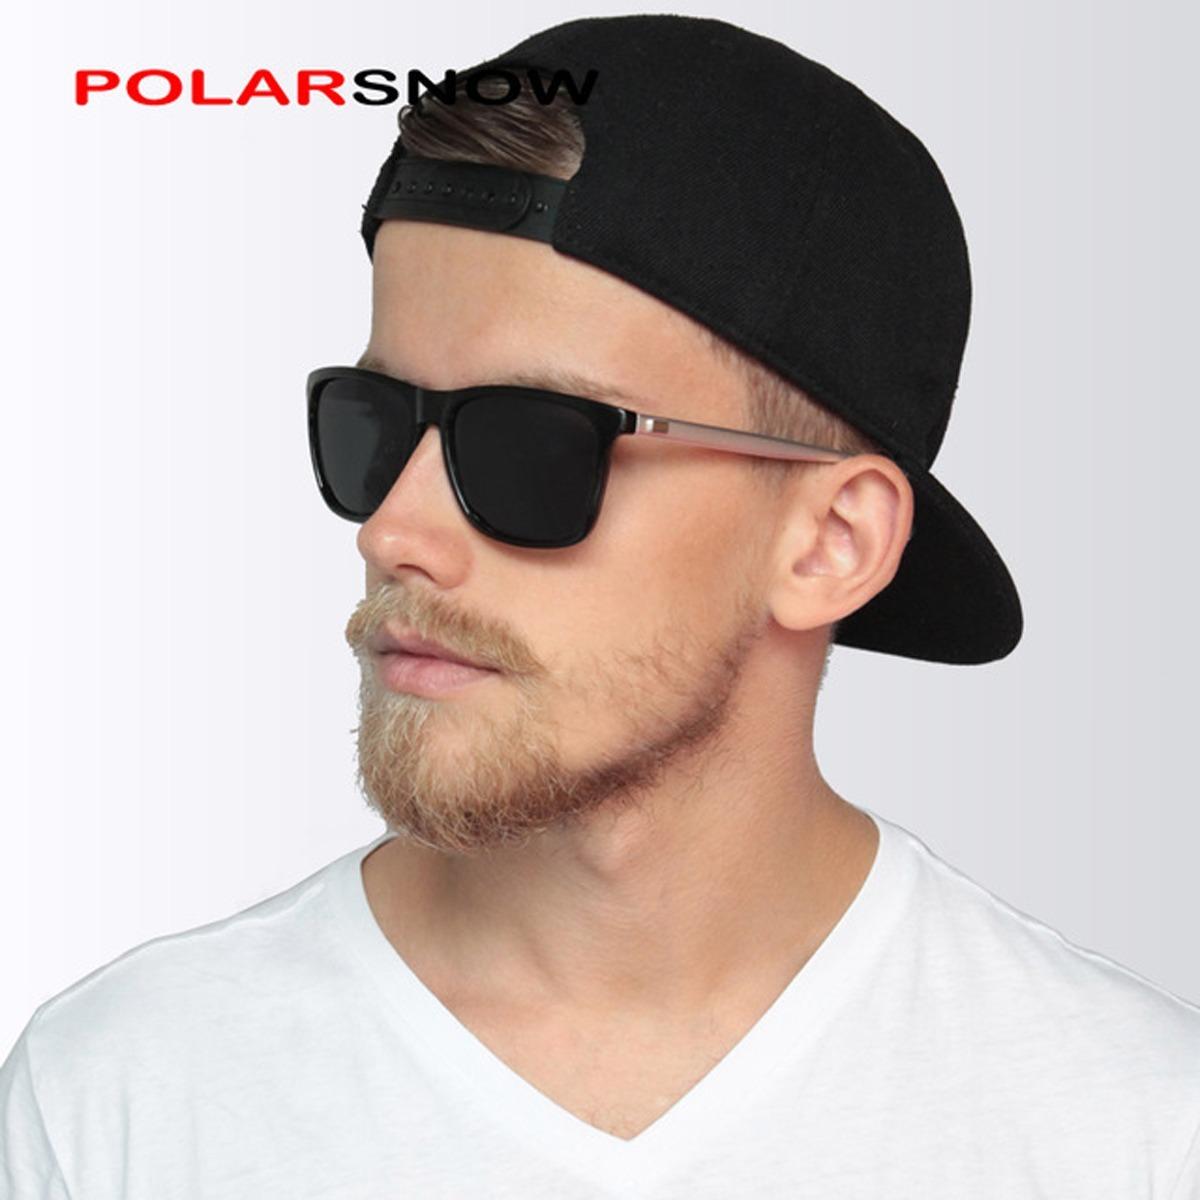 b01650fd7ca81 oculos grife solar masculino p8961 polarizado uv importado. Carregando zoom.